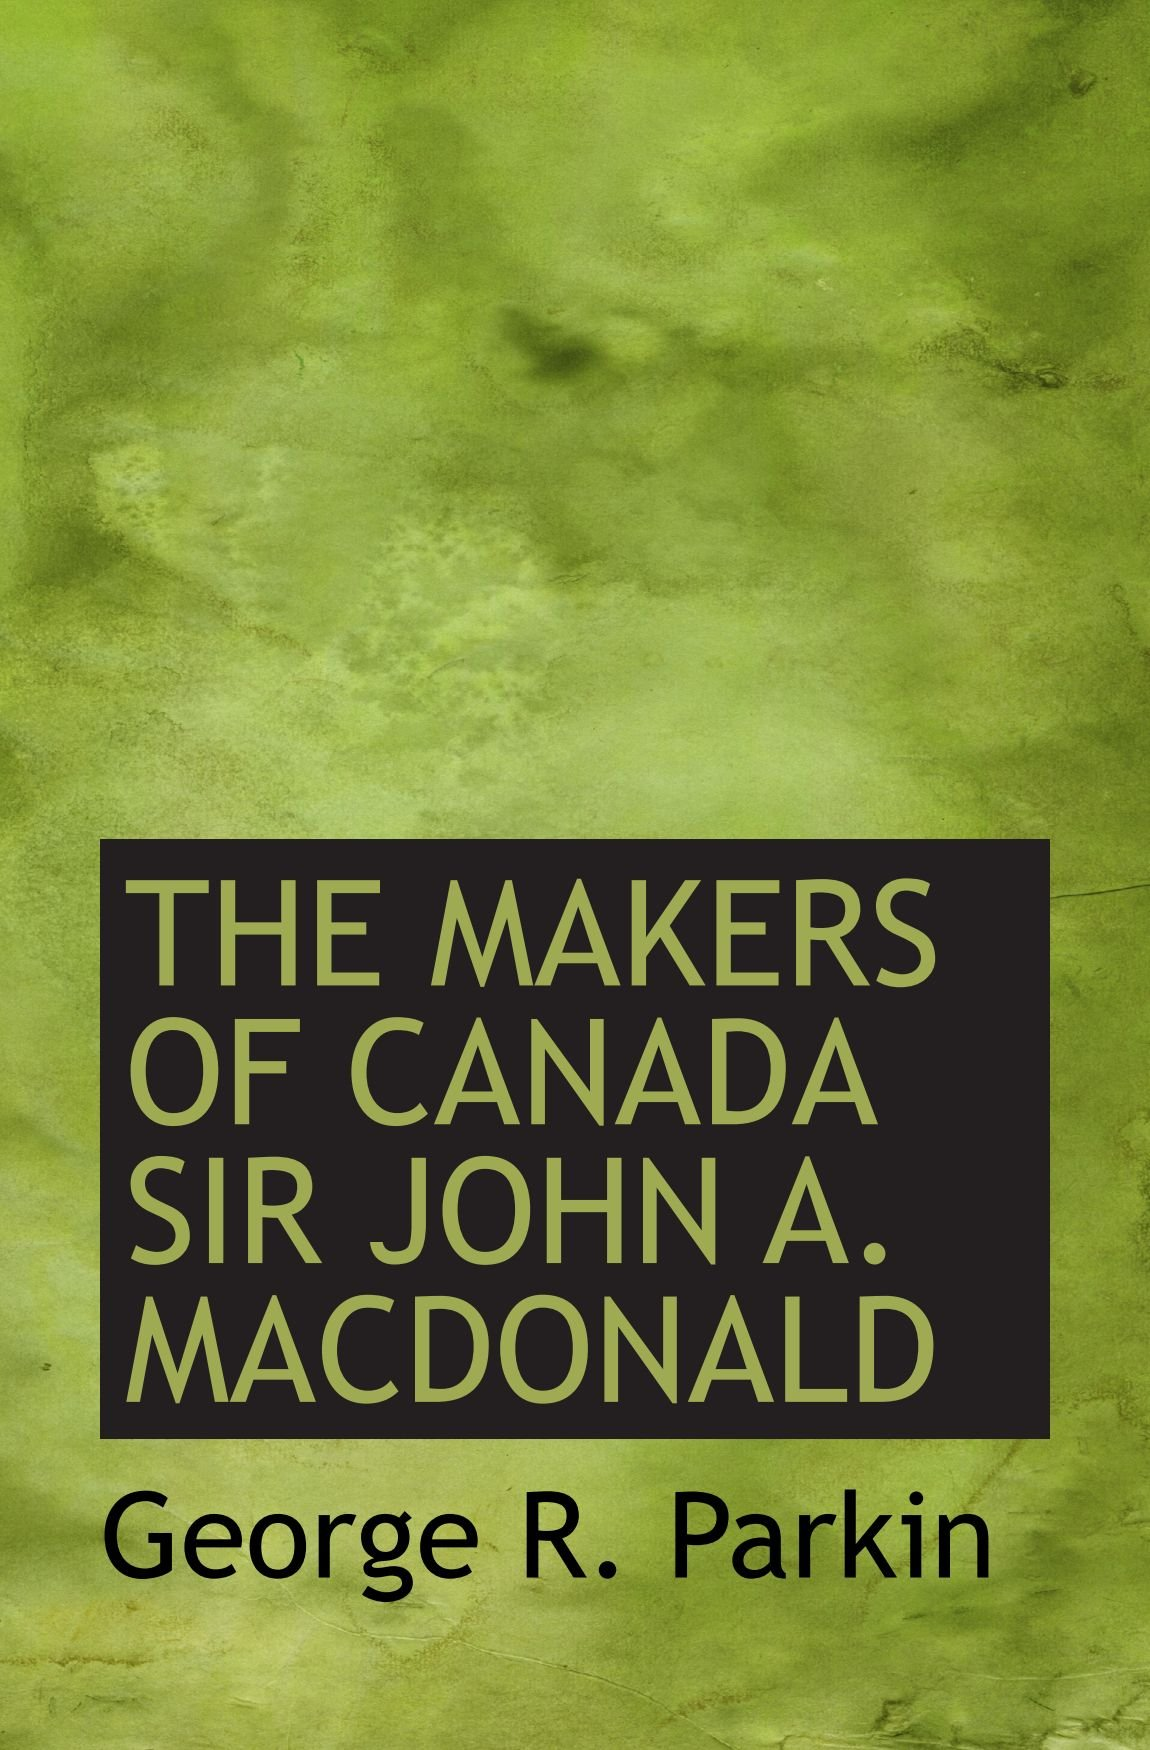 THE MAKERS OF CANADA SIR JOHN A. MACDONALD pdf epub